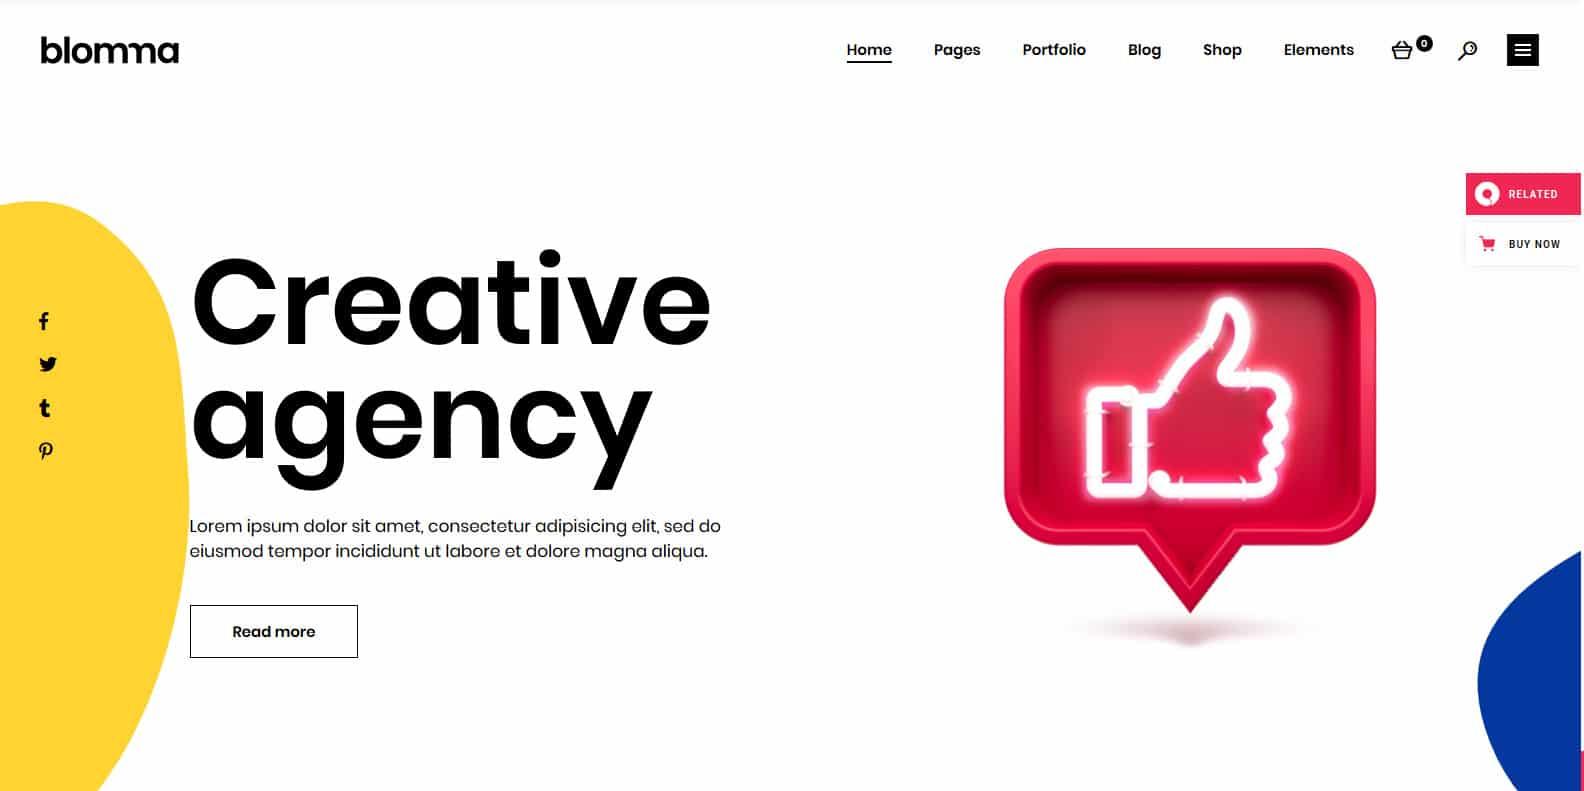 blomma-graphic-designer-website-template